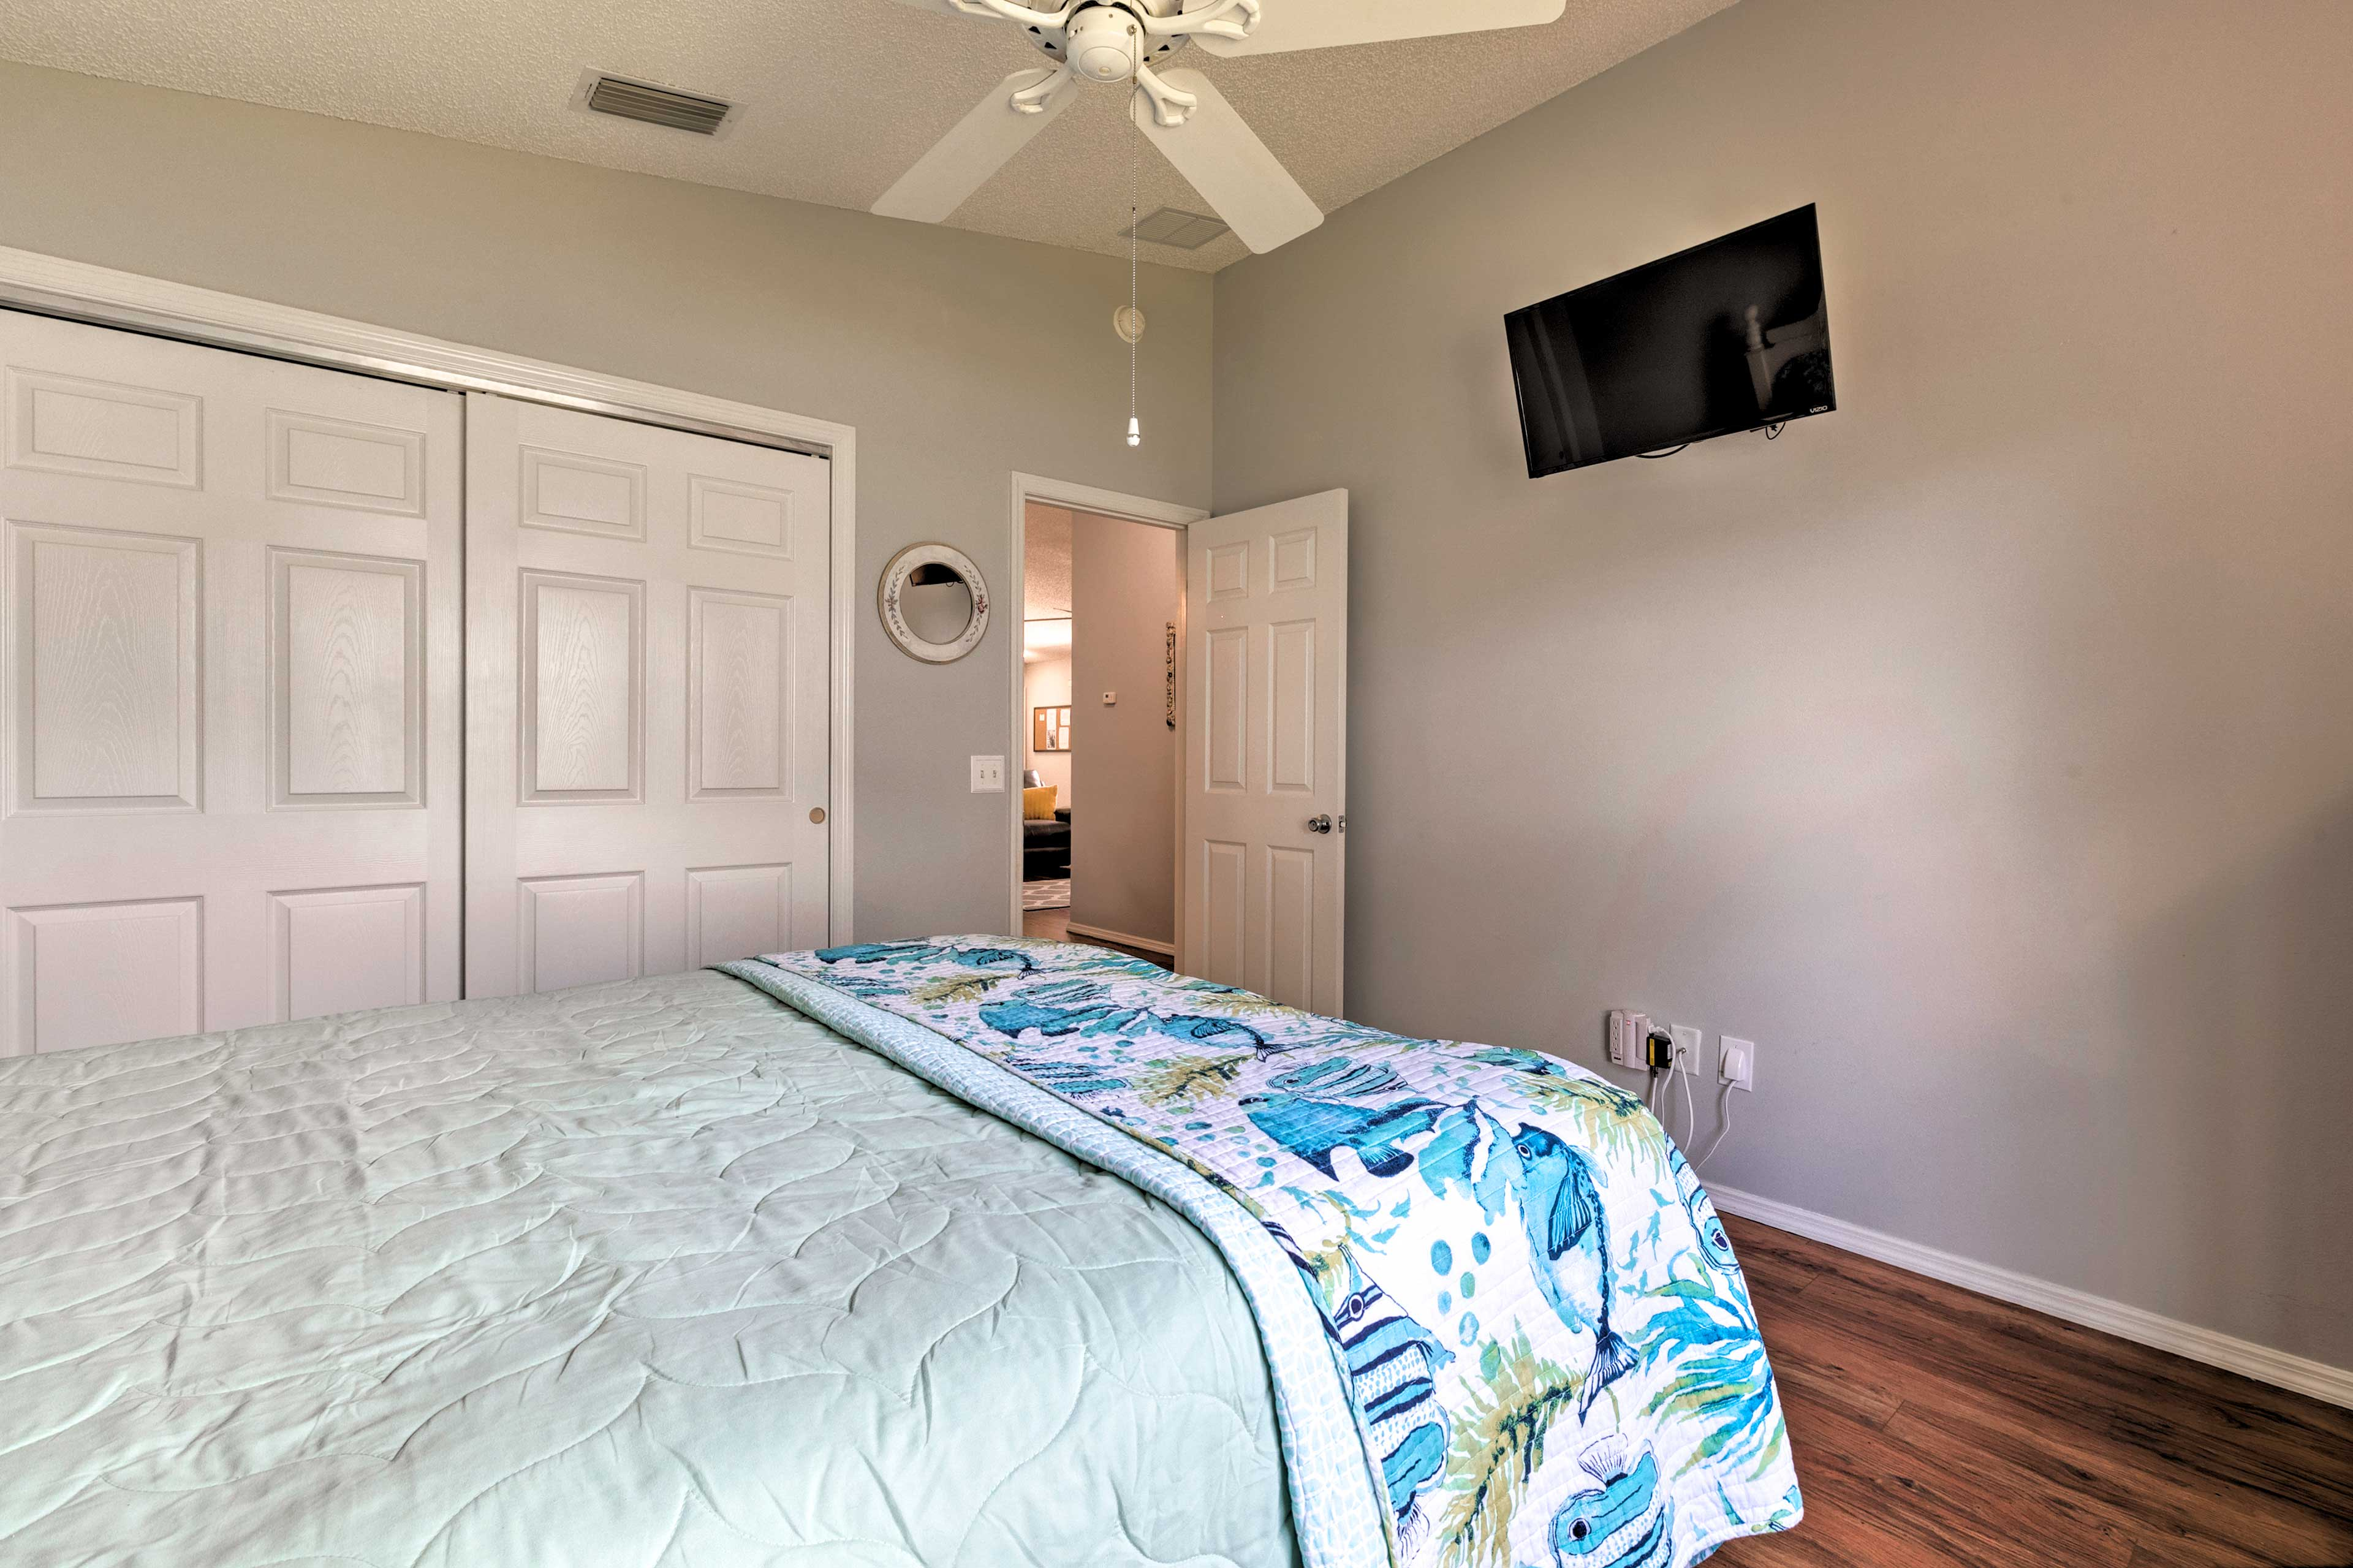 Both bedrooms have flat-screen TVs!